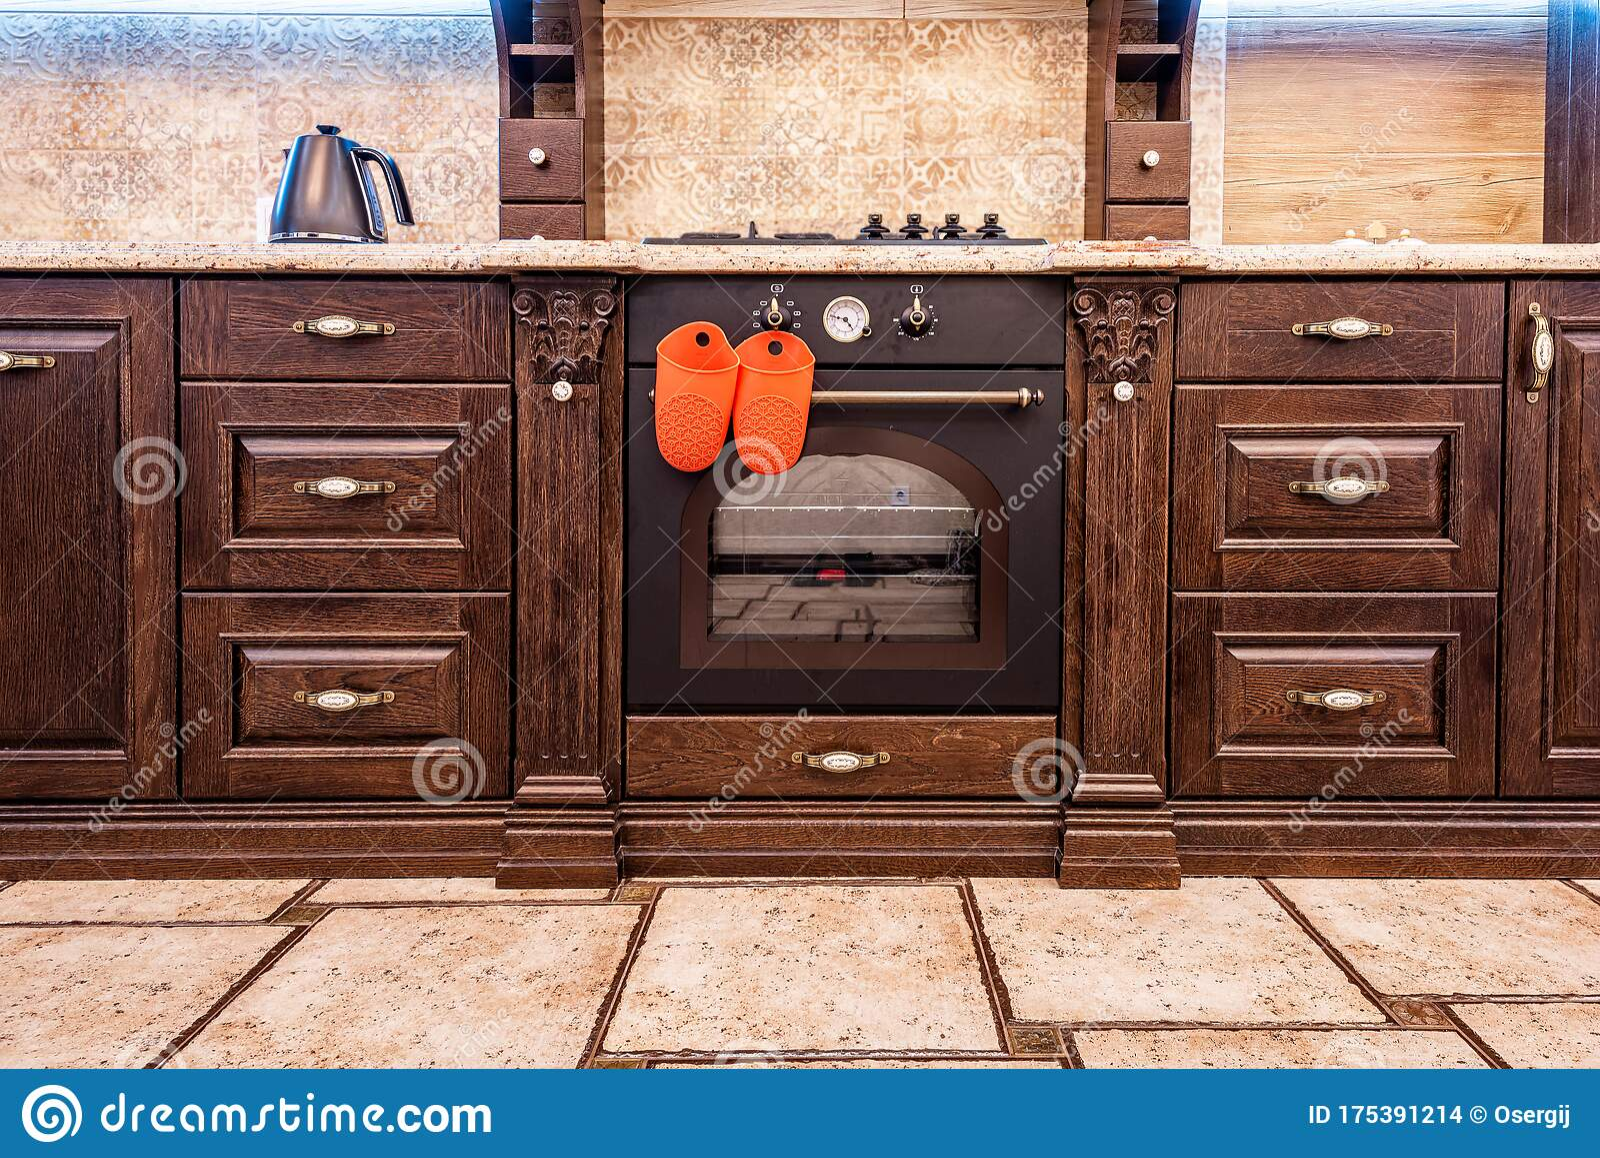 5,5 Old Kitchen Furniture Photos - Free & Royalty-Free Stock